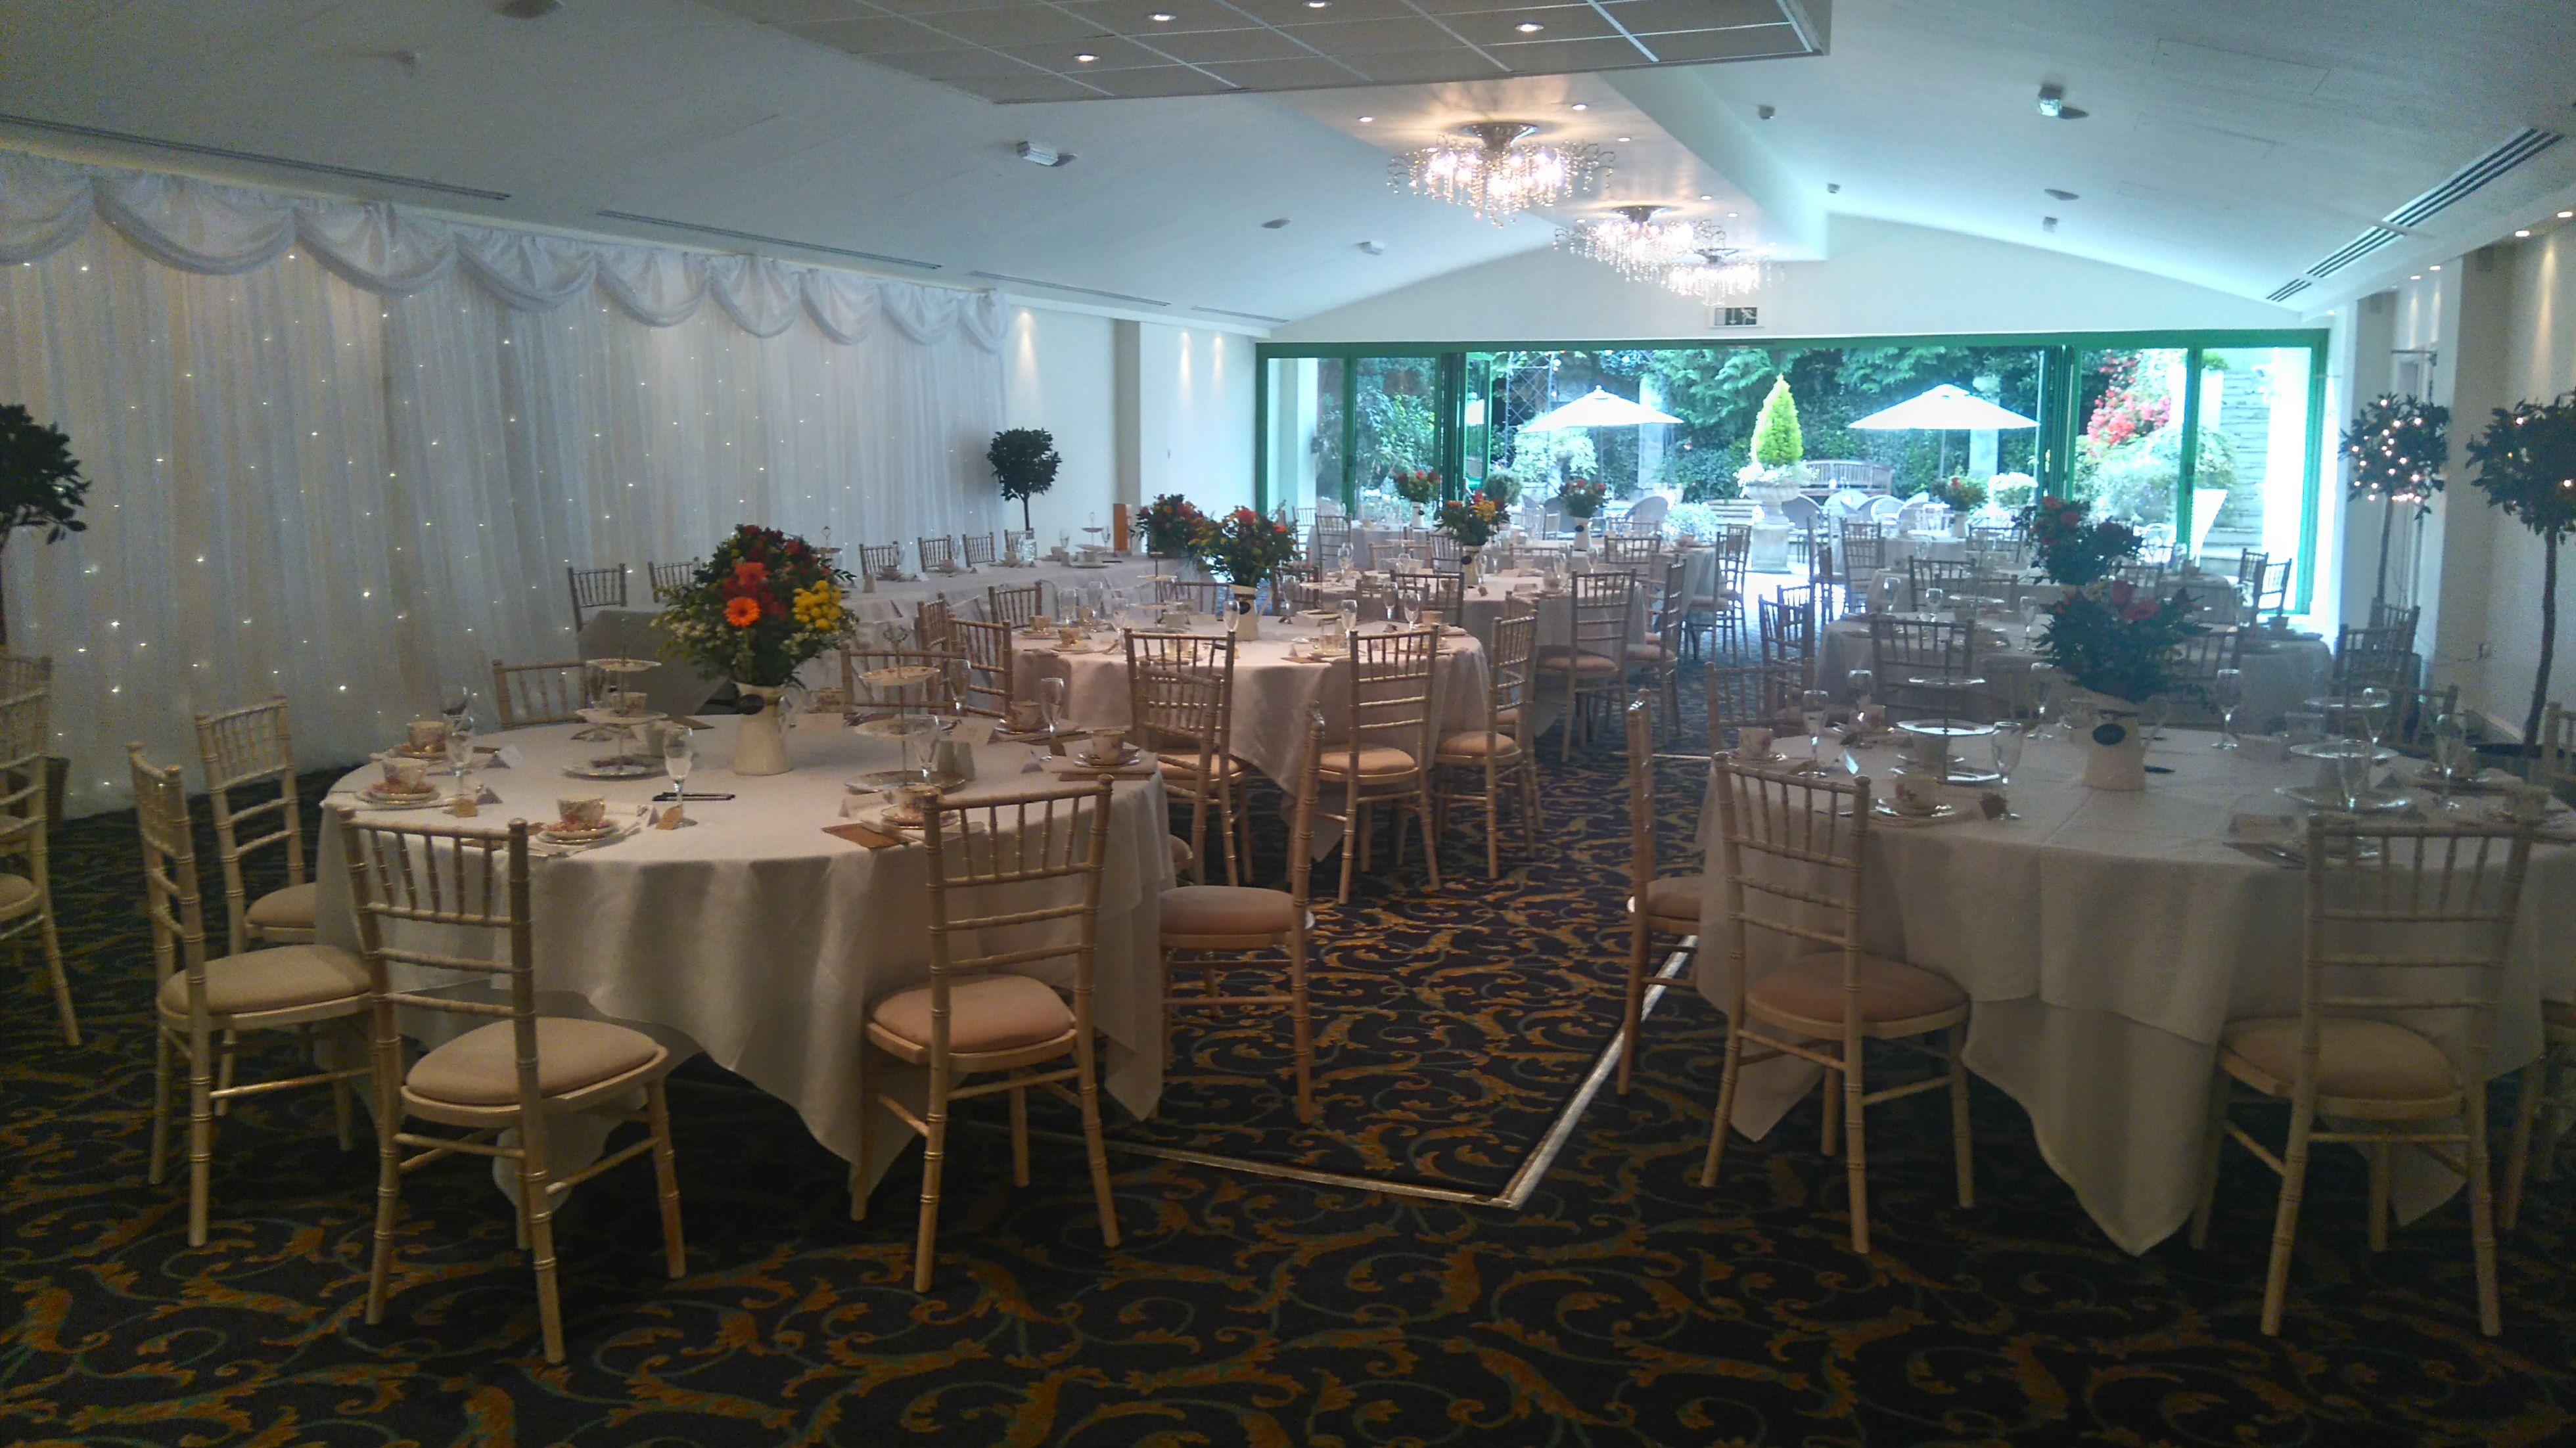 Limewash chiavari chairs supplied to The Bear Hotel by Simply Bows